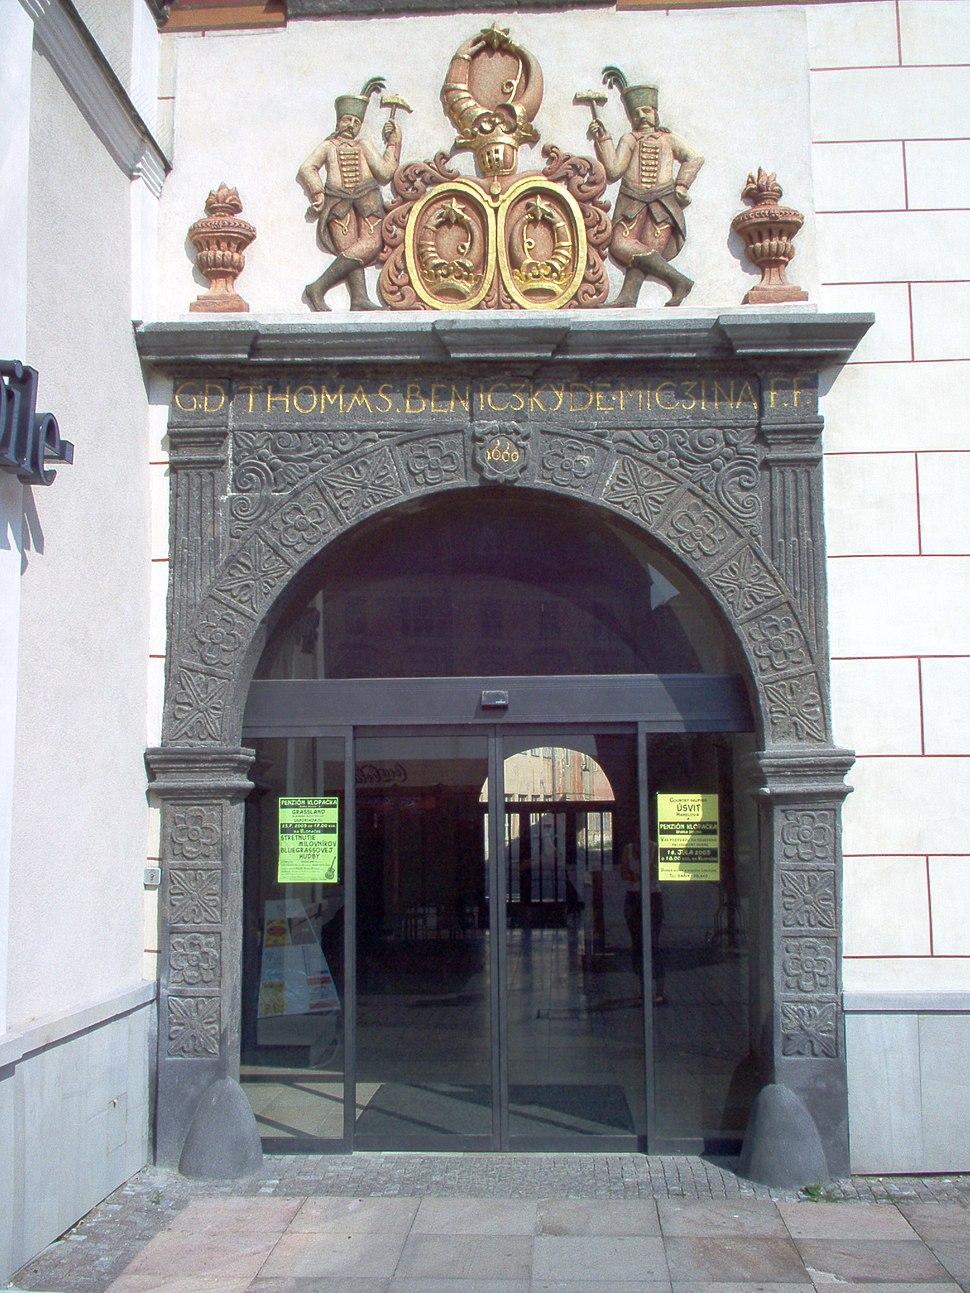 Banska Bystrica Benicky house coat of arms